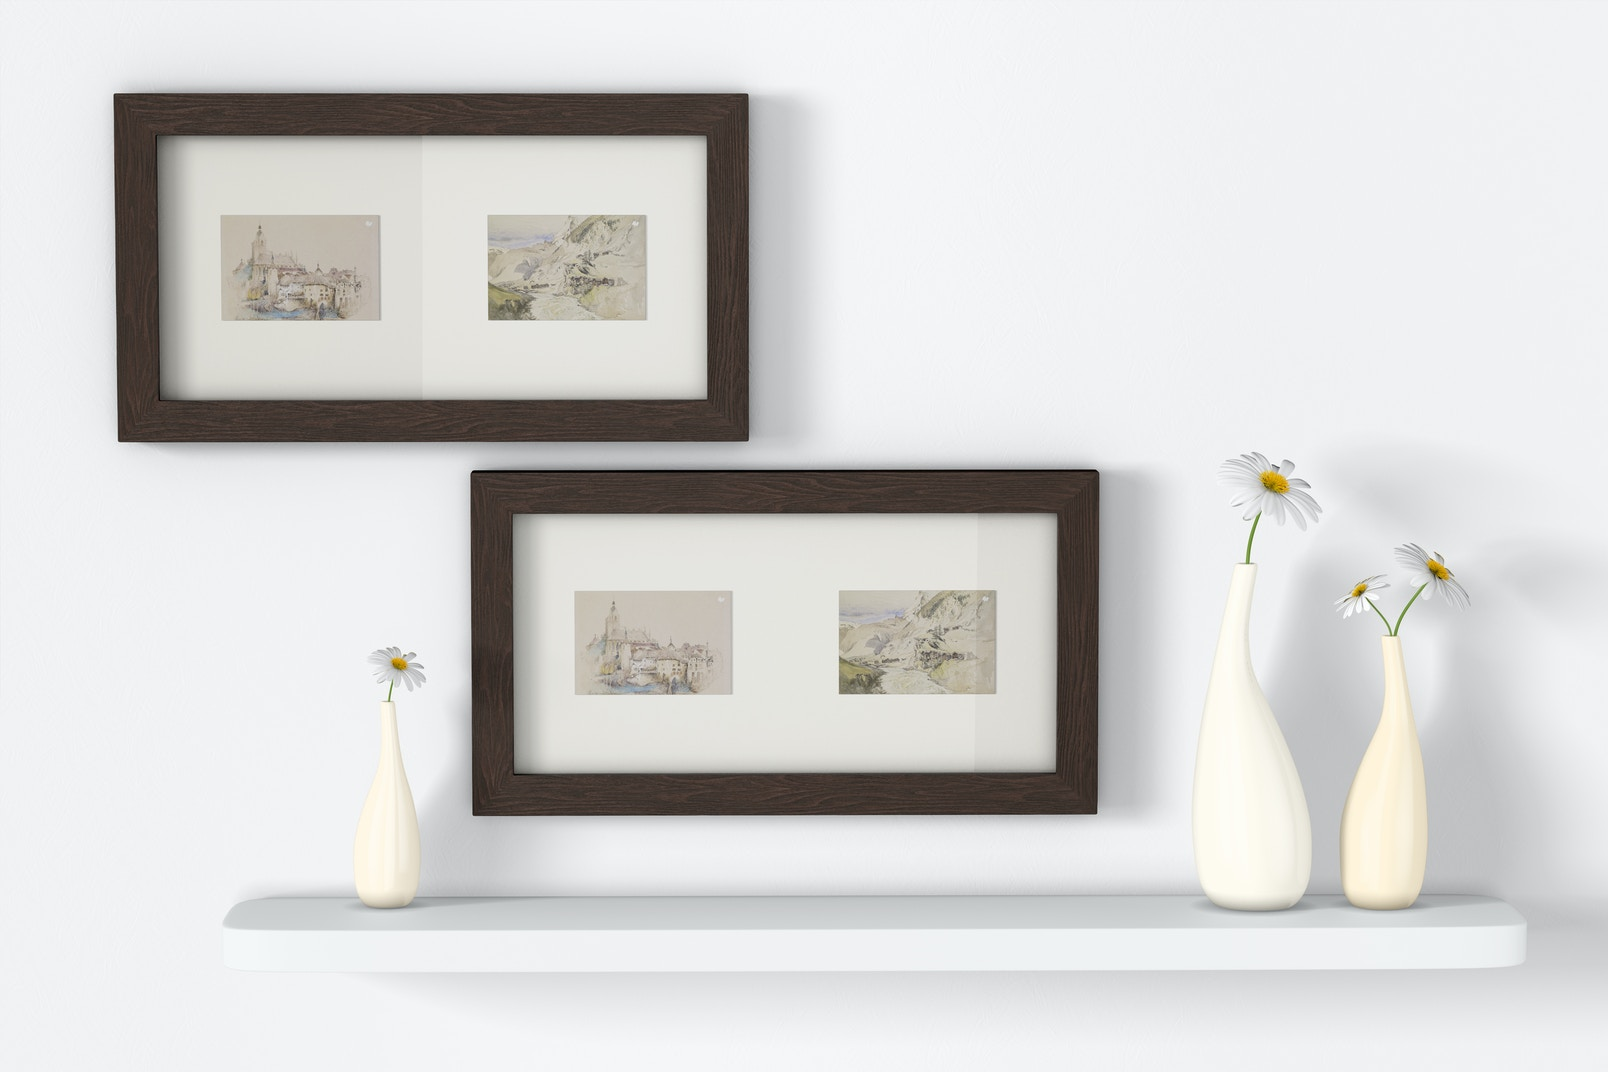 4:6 Multiple Photo Frames with Flower Pots Mockup